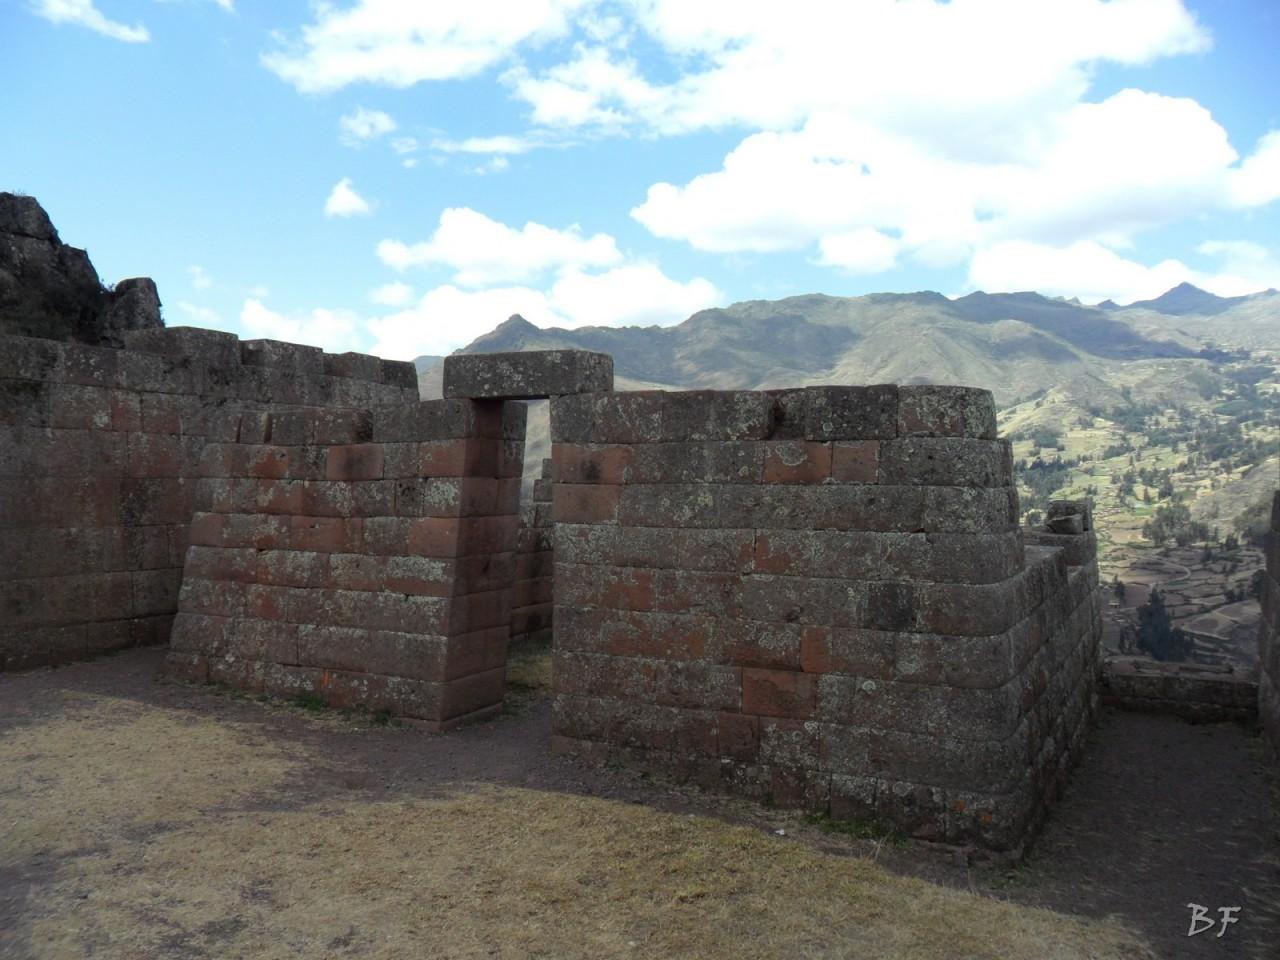 Mura-Poligonali-Megaliti-Altari-Rupestri-Pisac-Cusco-Perù-48